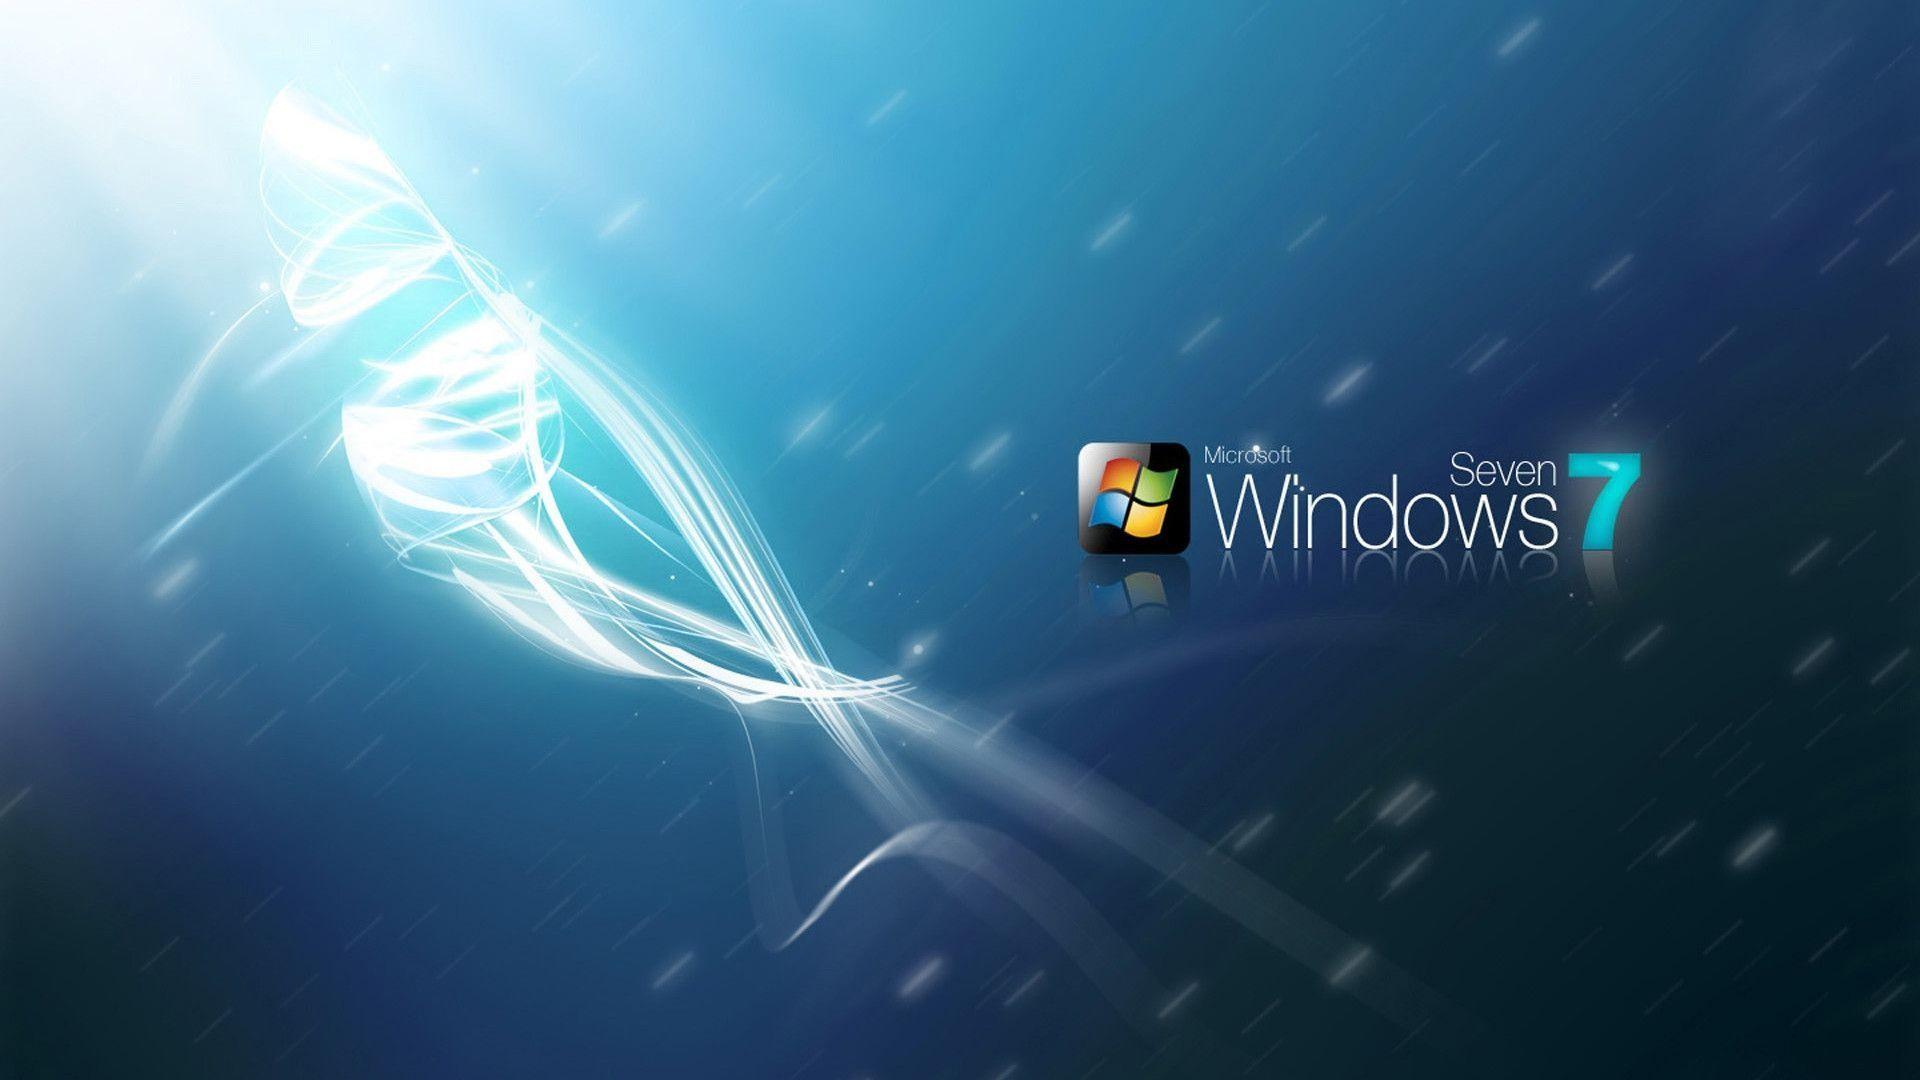 Res: 1920x1080, Wallpapers For Desktop Vista Hd Desktop 9 HD Wallpapers   Hdwalljoy.